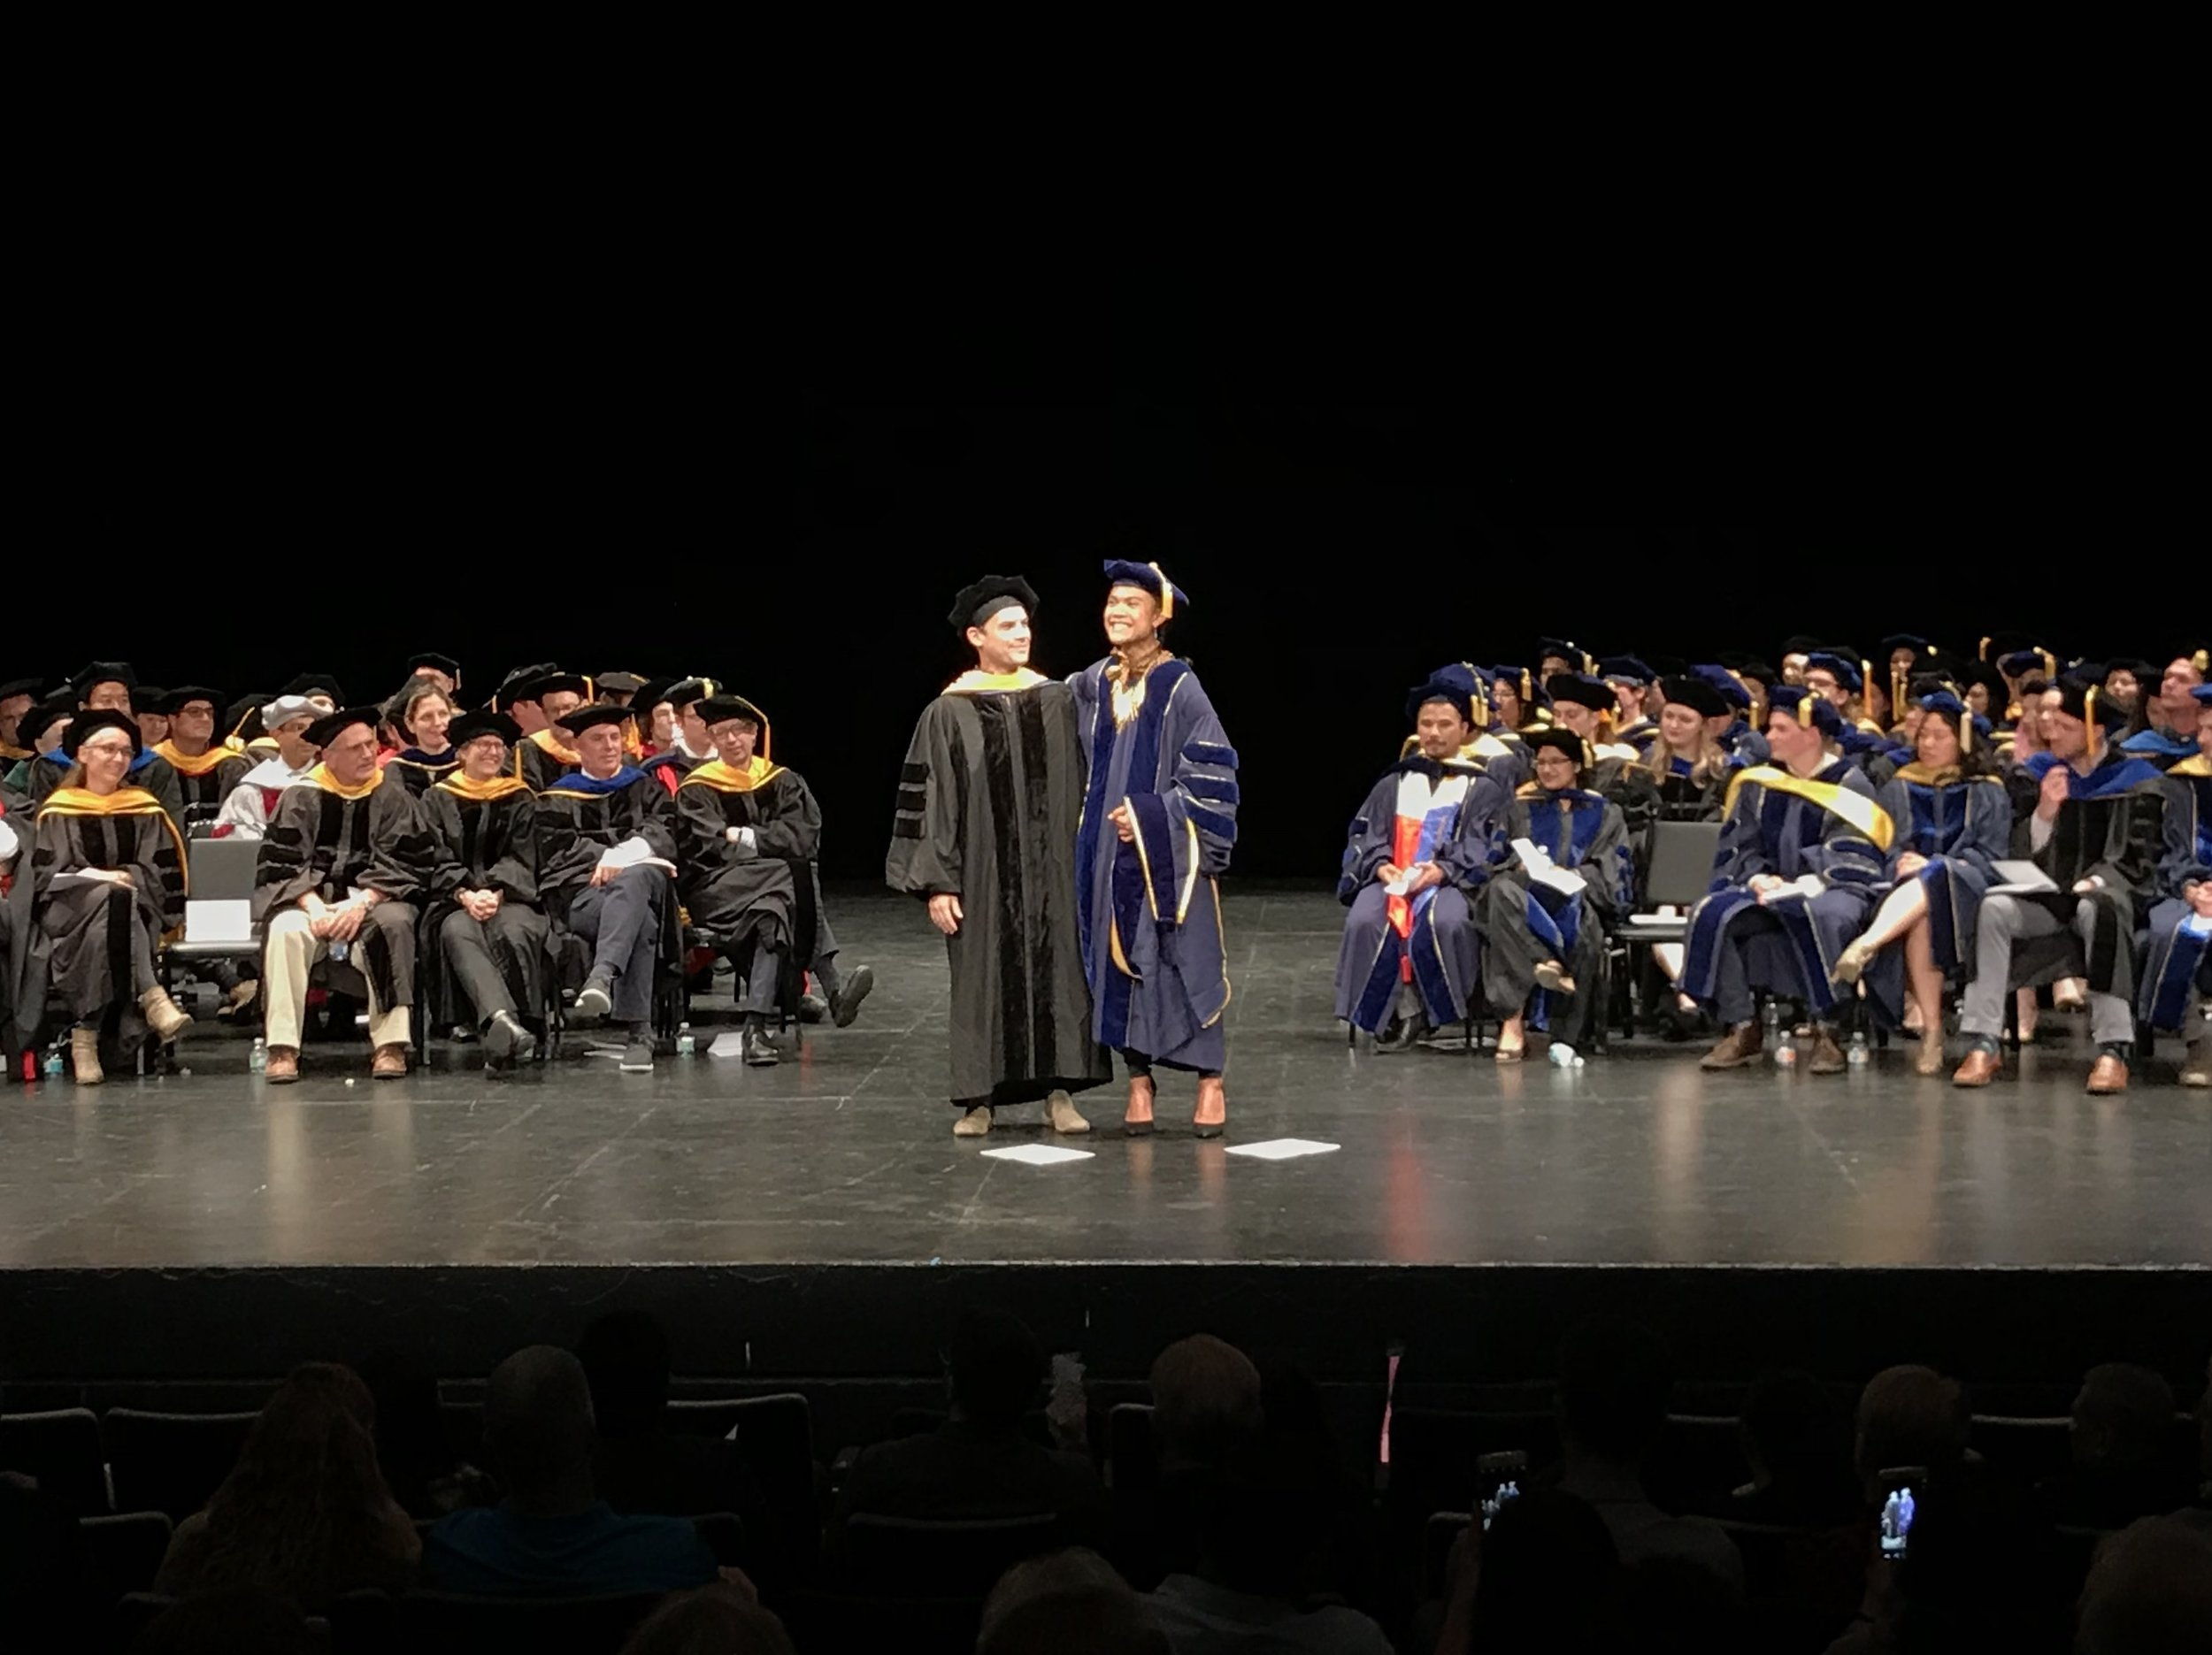 Brian Graduation.jpg